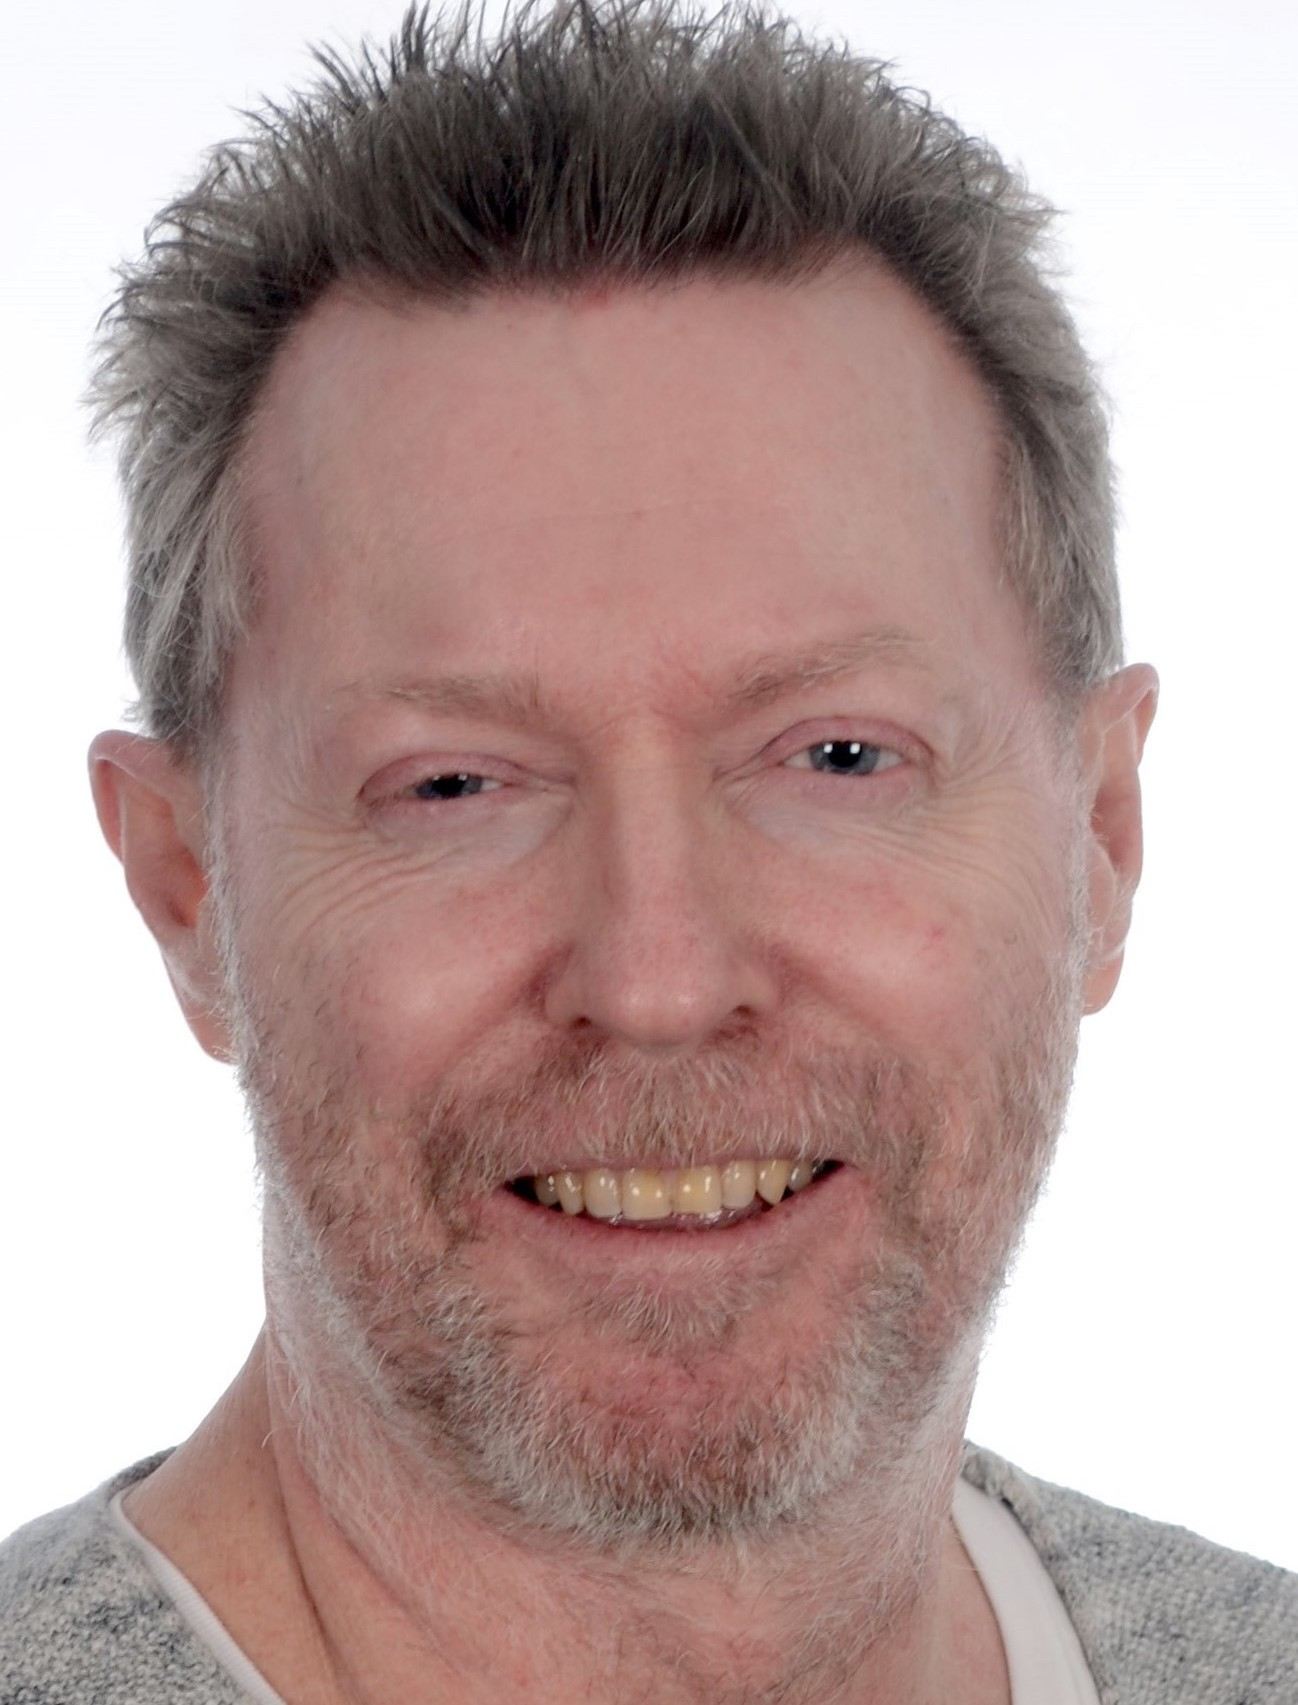 Joakim Öberg